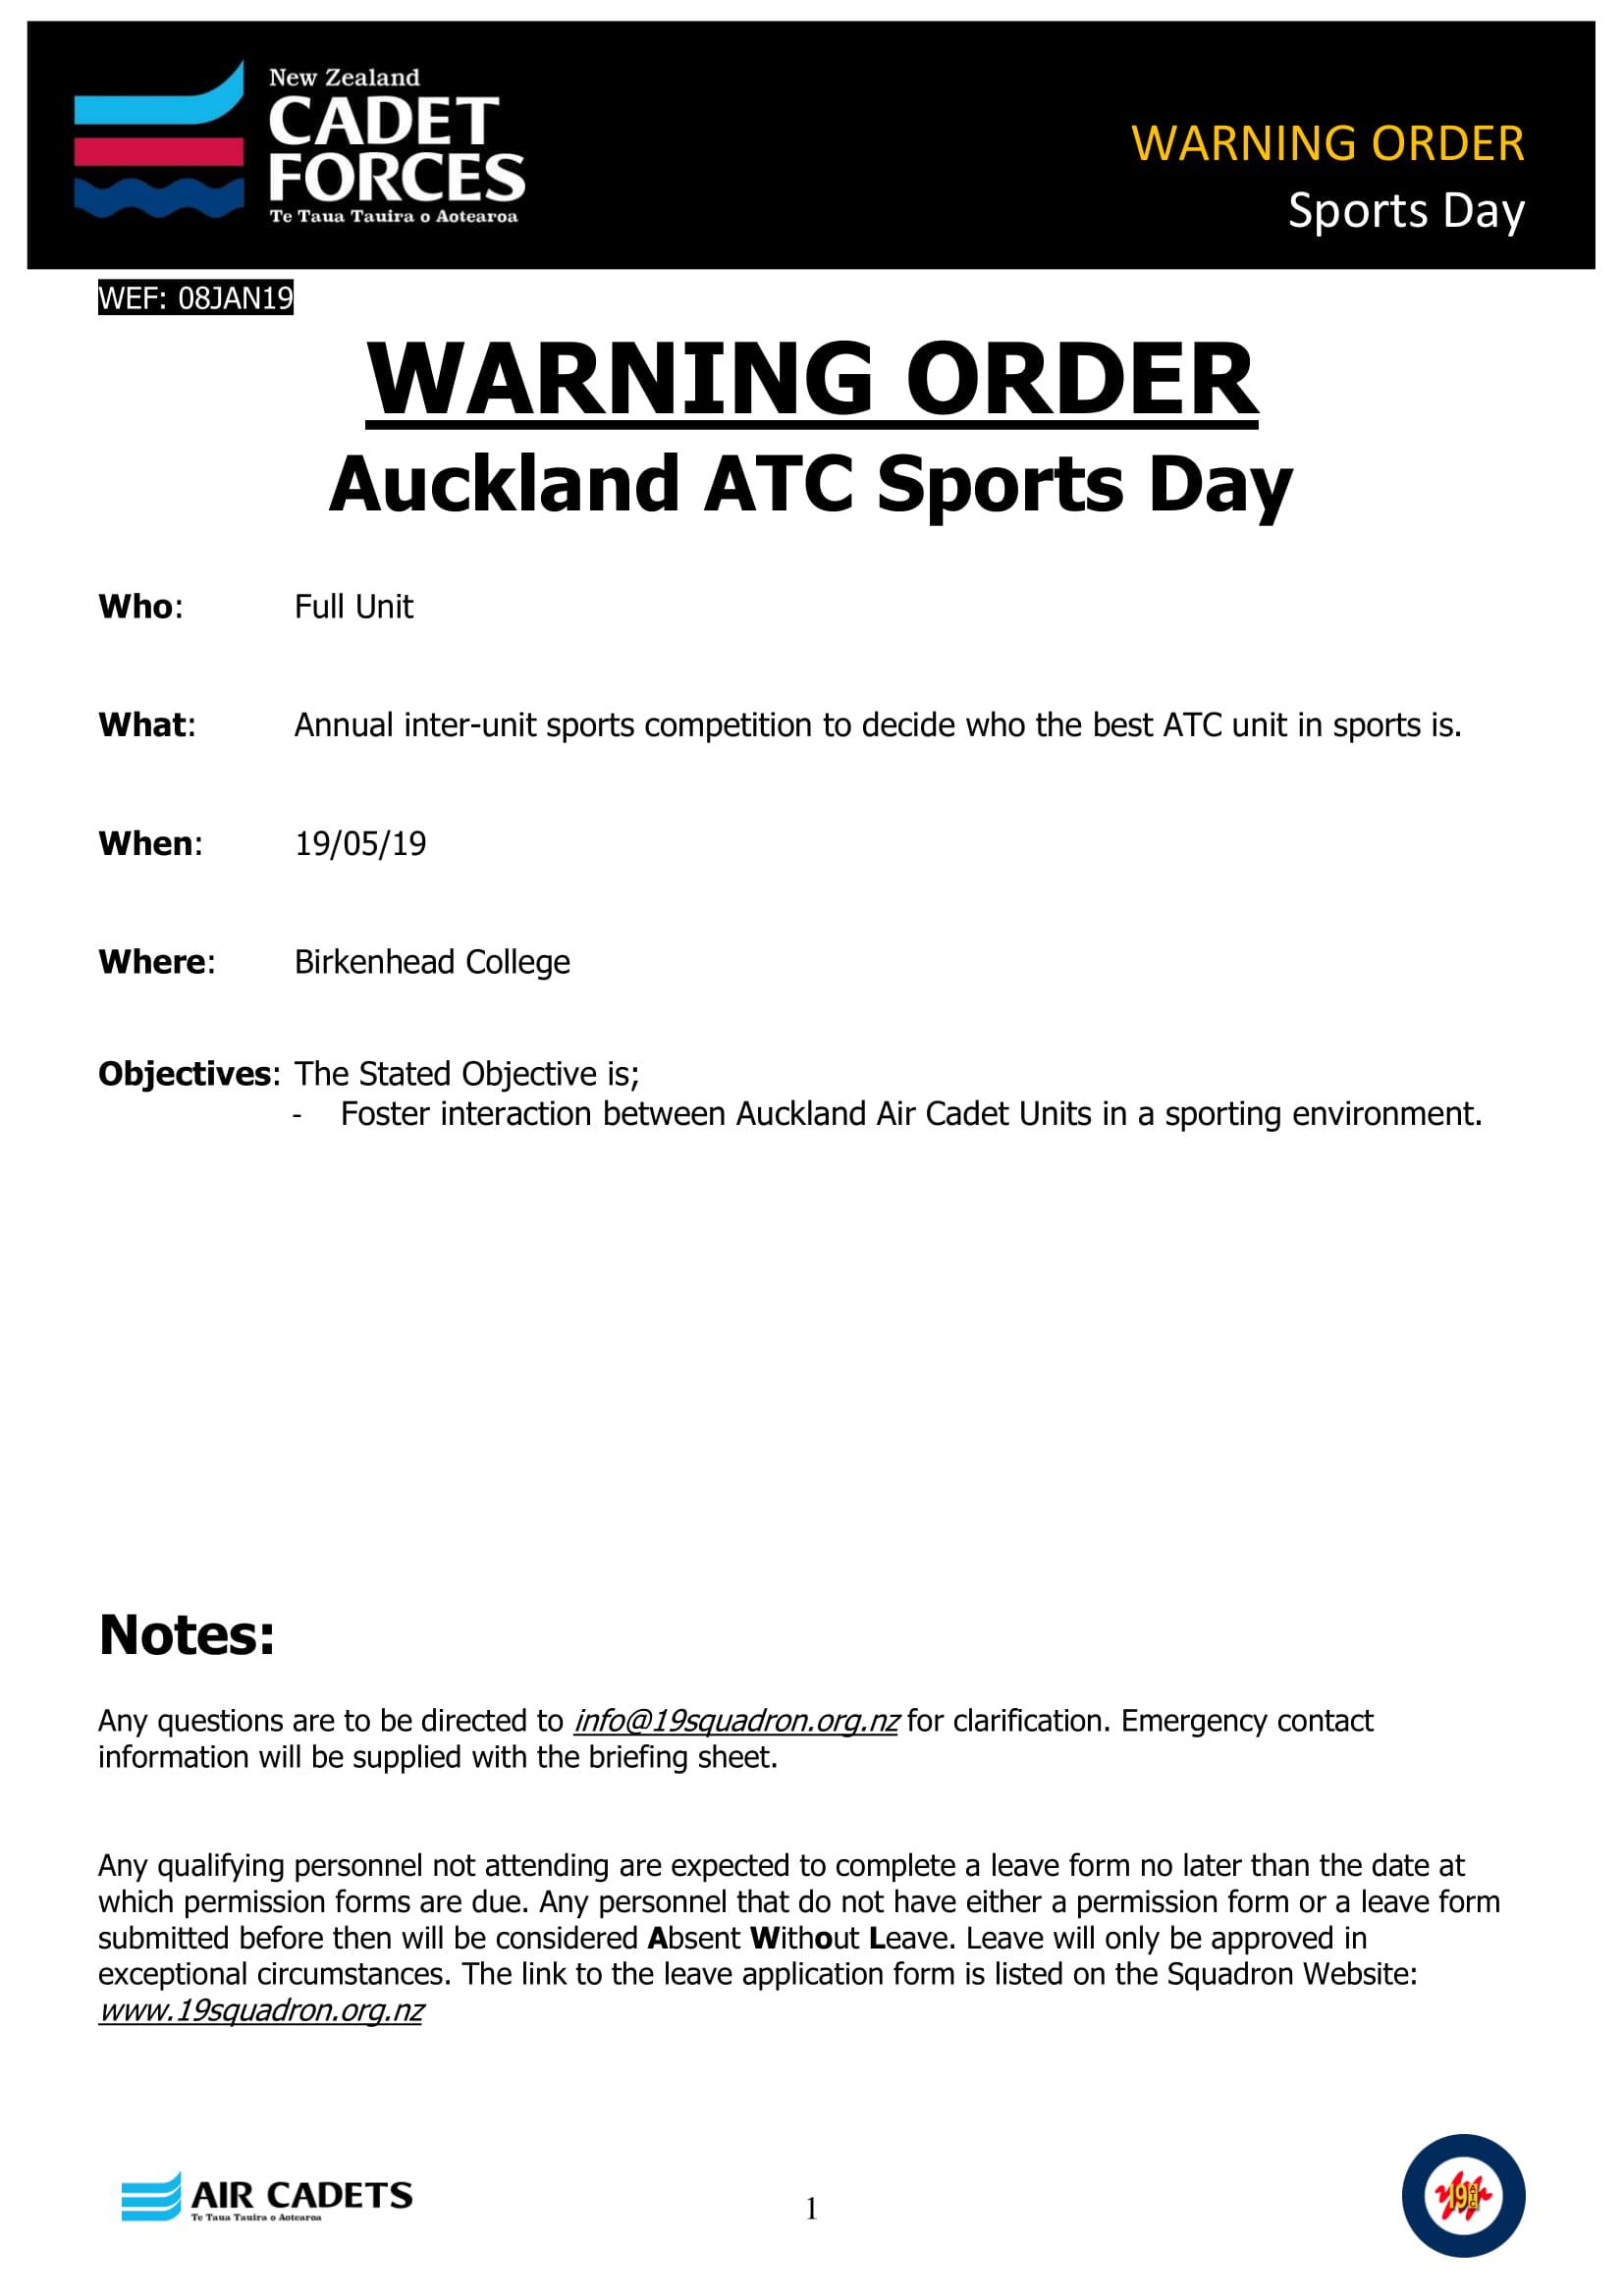 Sports Day - Warning Order-1.jpg